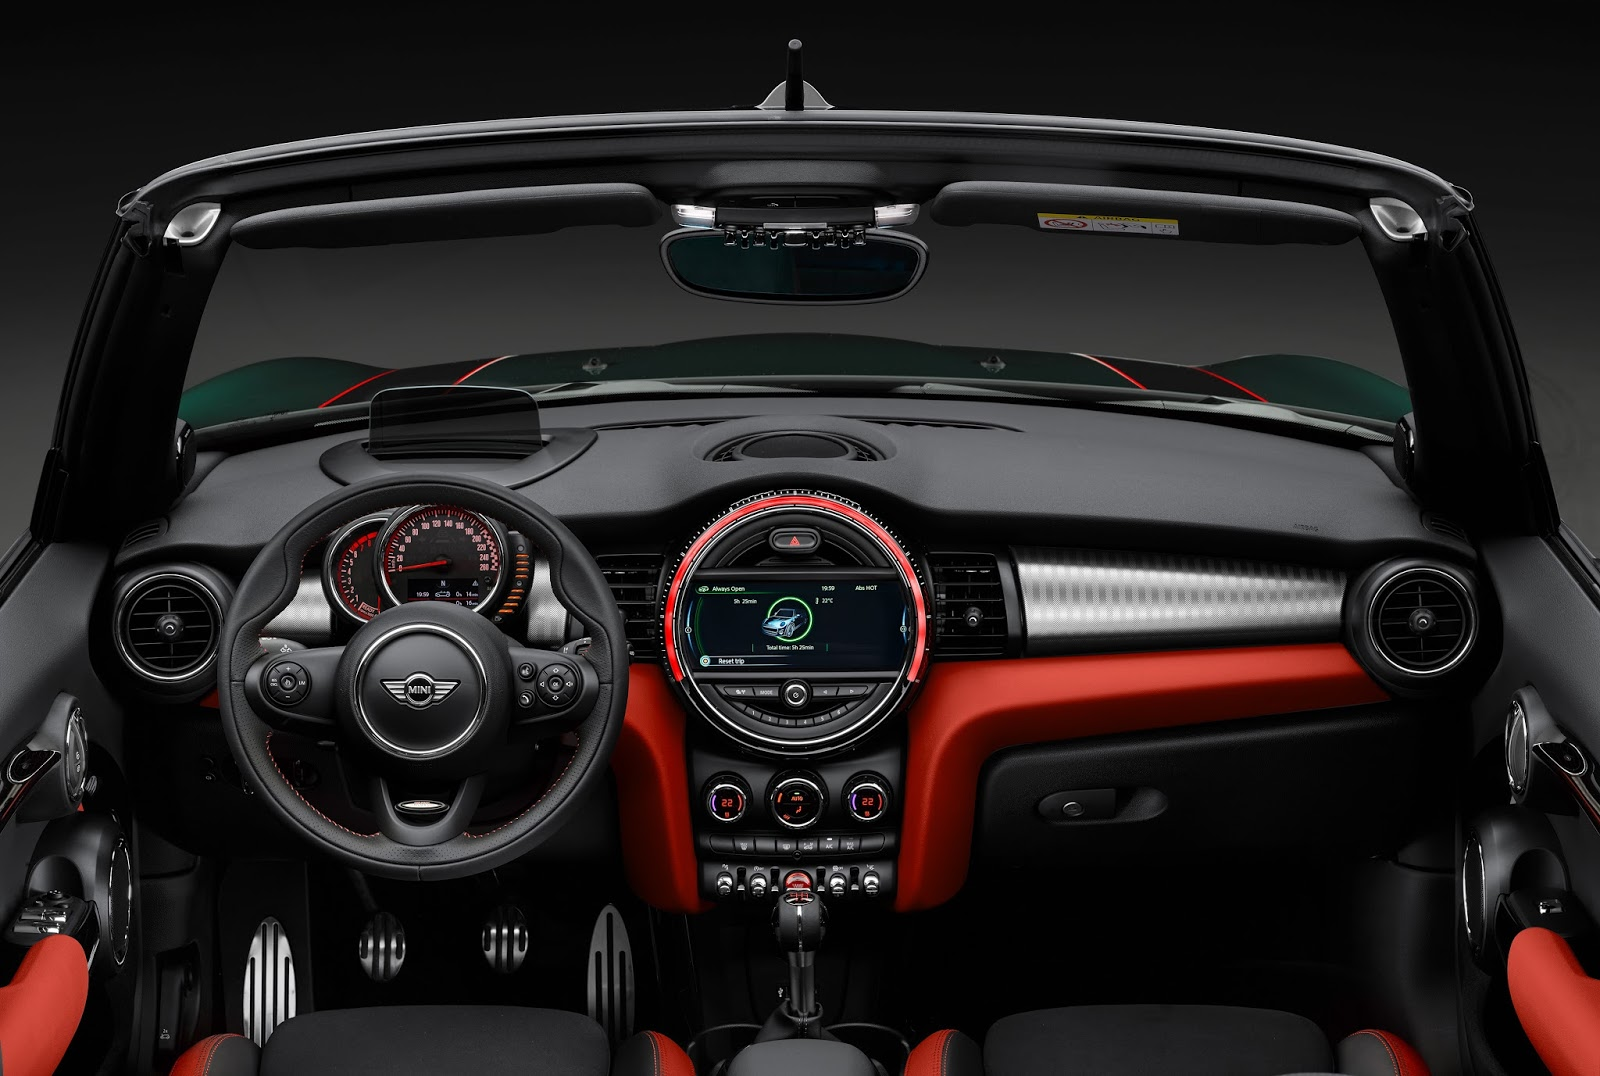 P90207707 highRes Έρχεται το νέο MINI John Cooper Works Cabrio με 231 ίππους